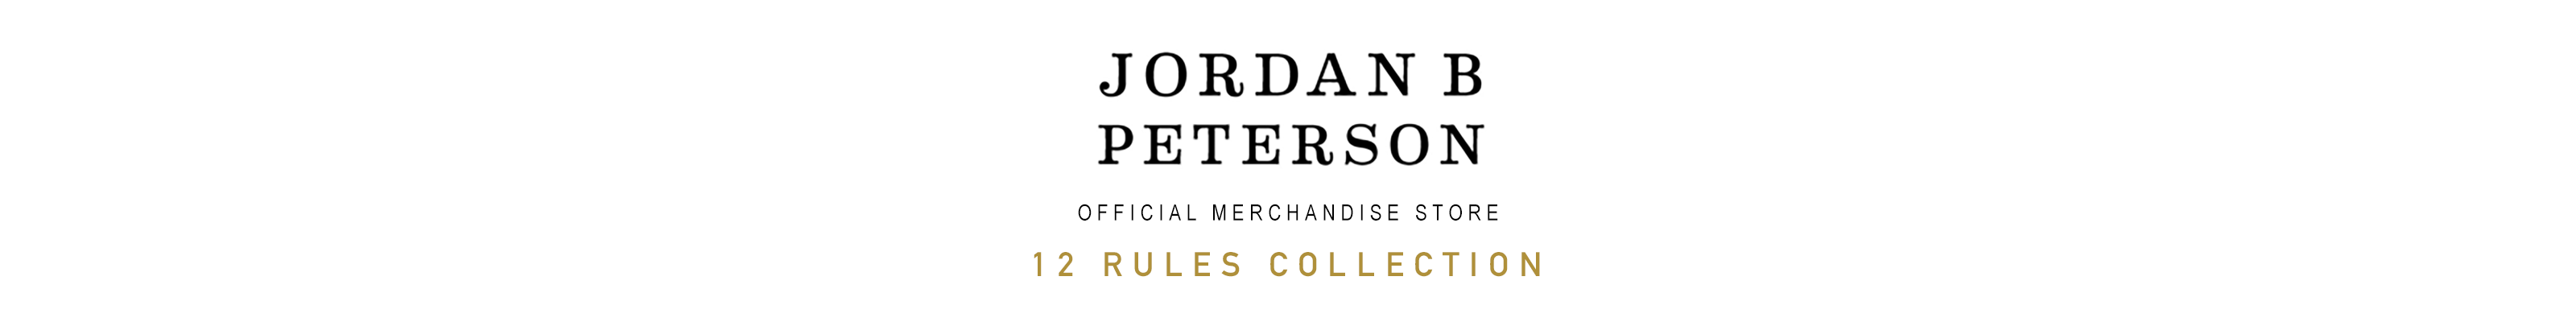 Jordan B Peterson Merchandise | Teespring